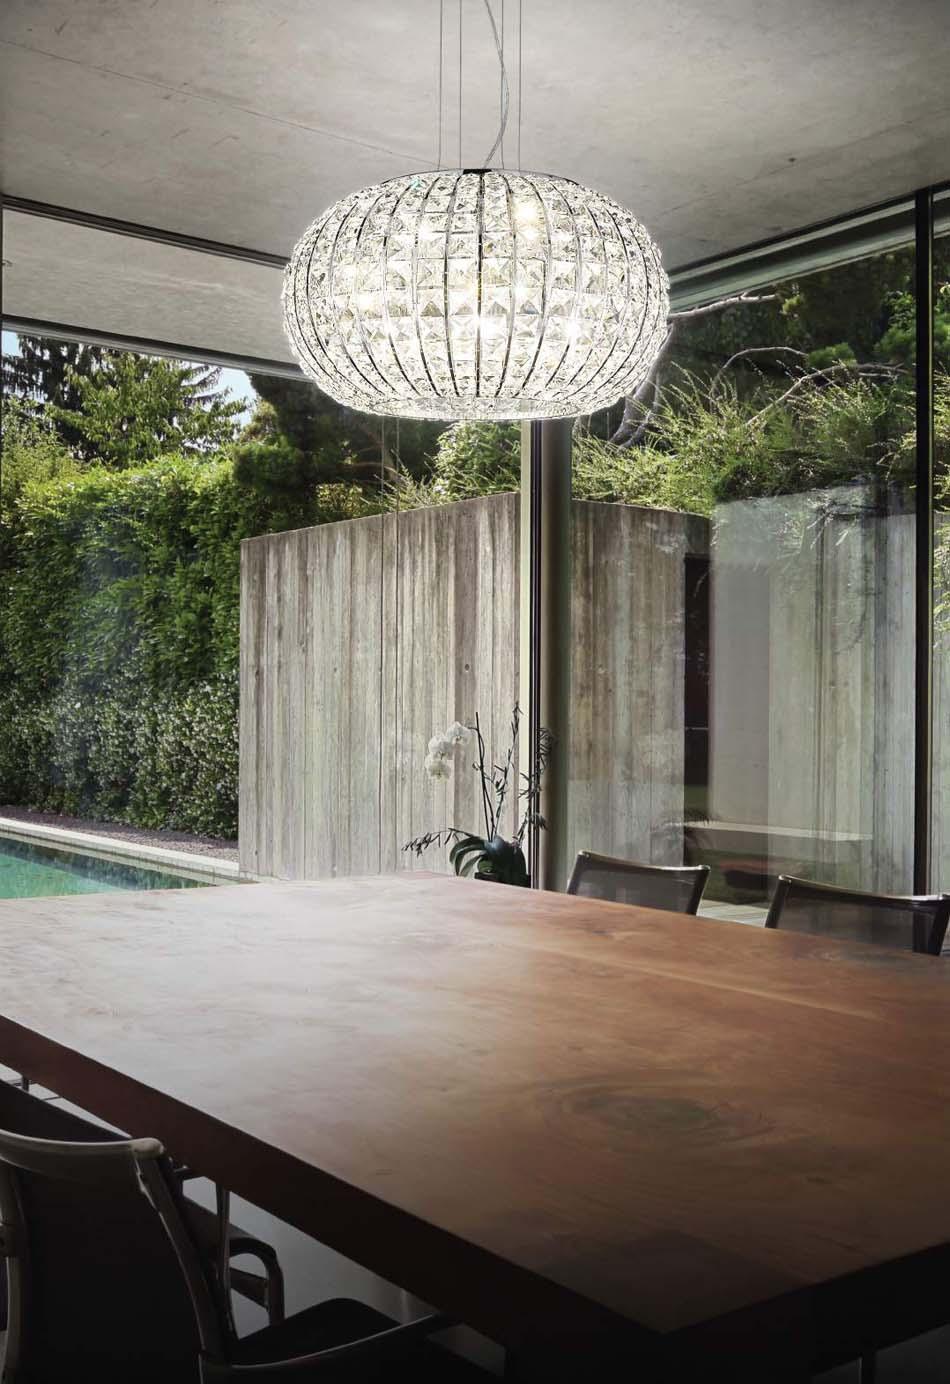 Lampade 35 sospensione Ideal Lux Calypso – Bruni Arredamenti